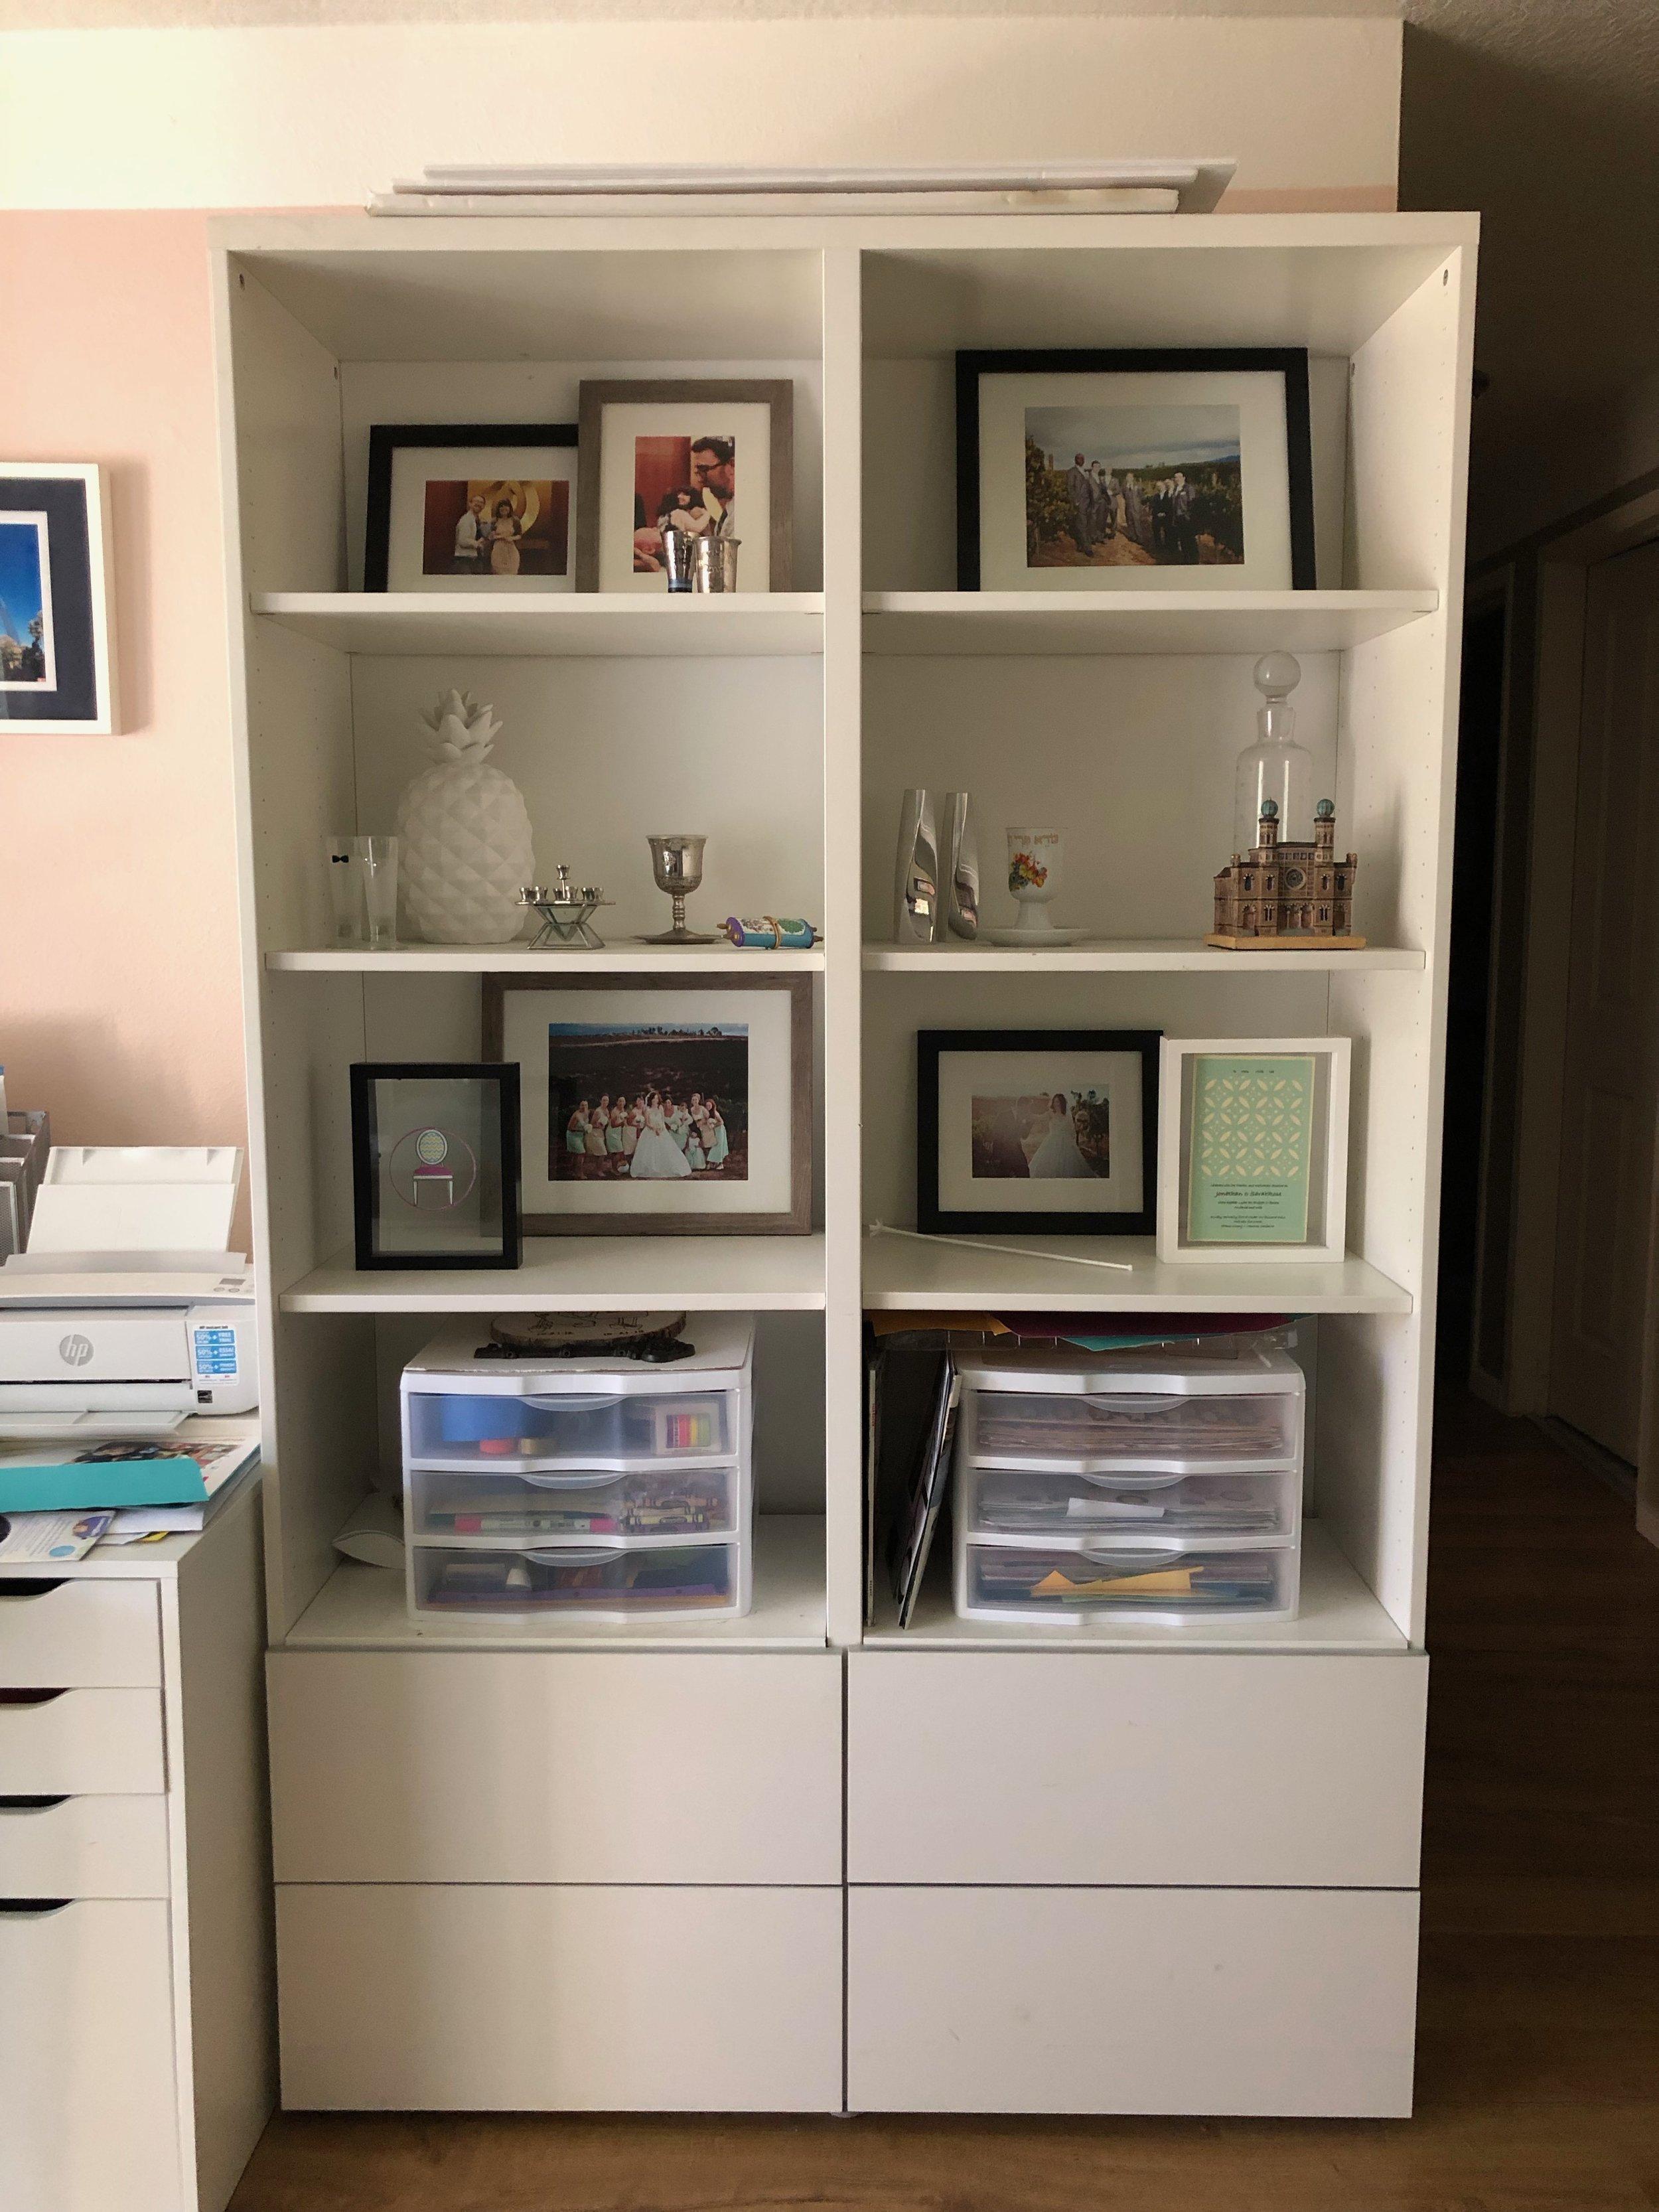 $100 Room Challenge, Wk 1: My Workspace- Before Photos